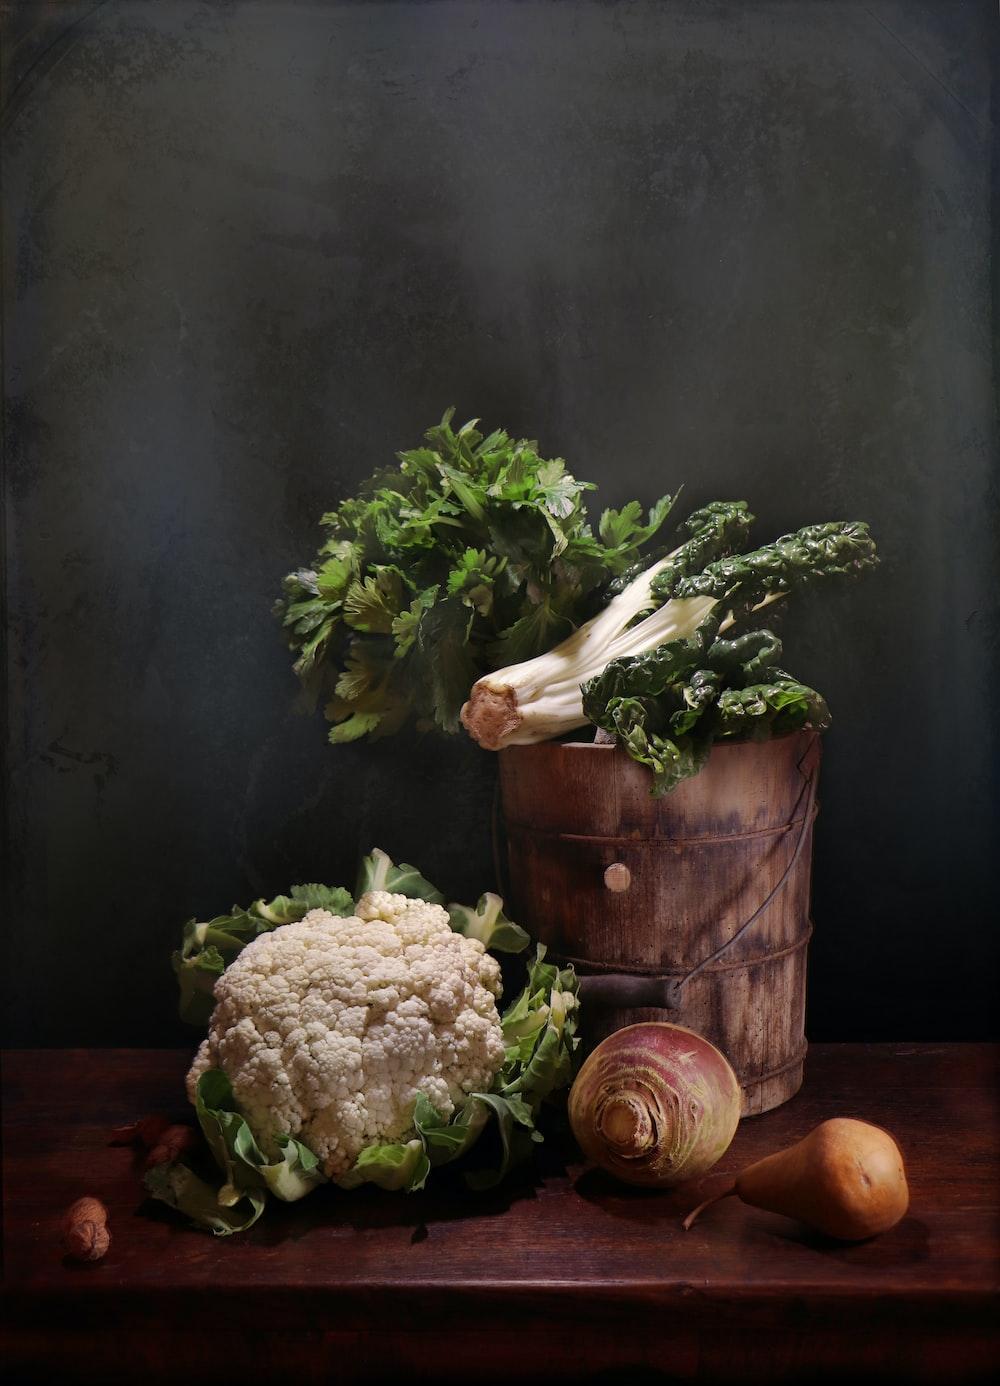 broccoli beside wall